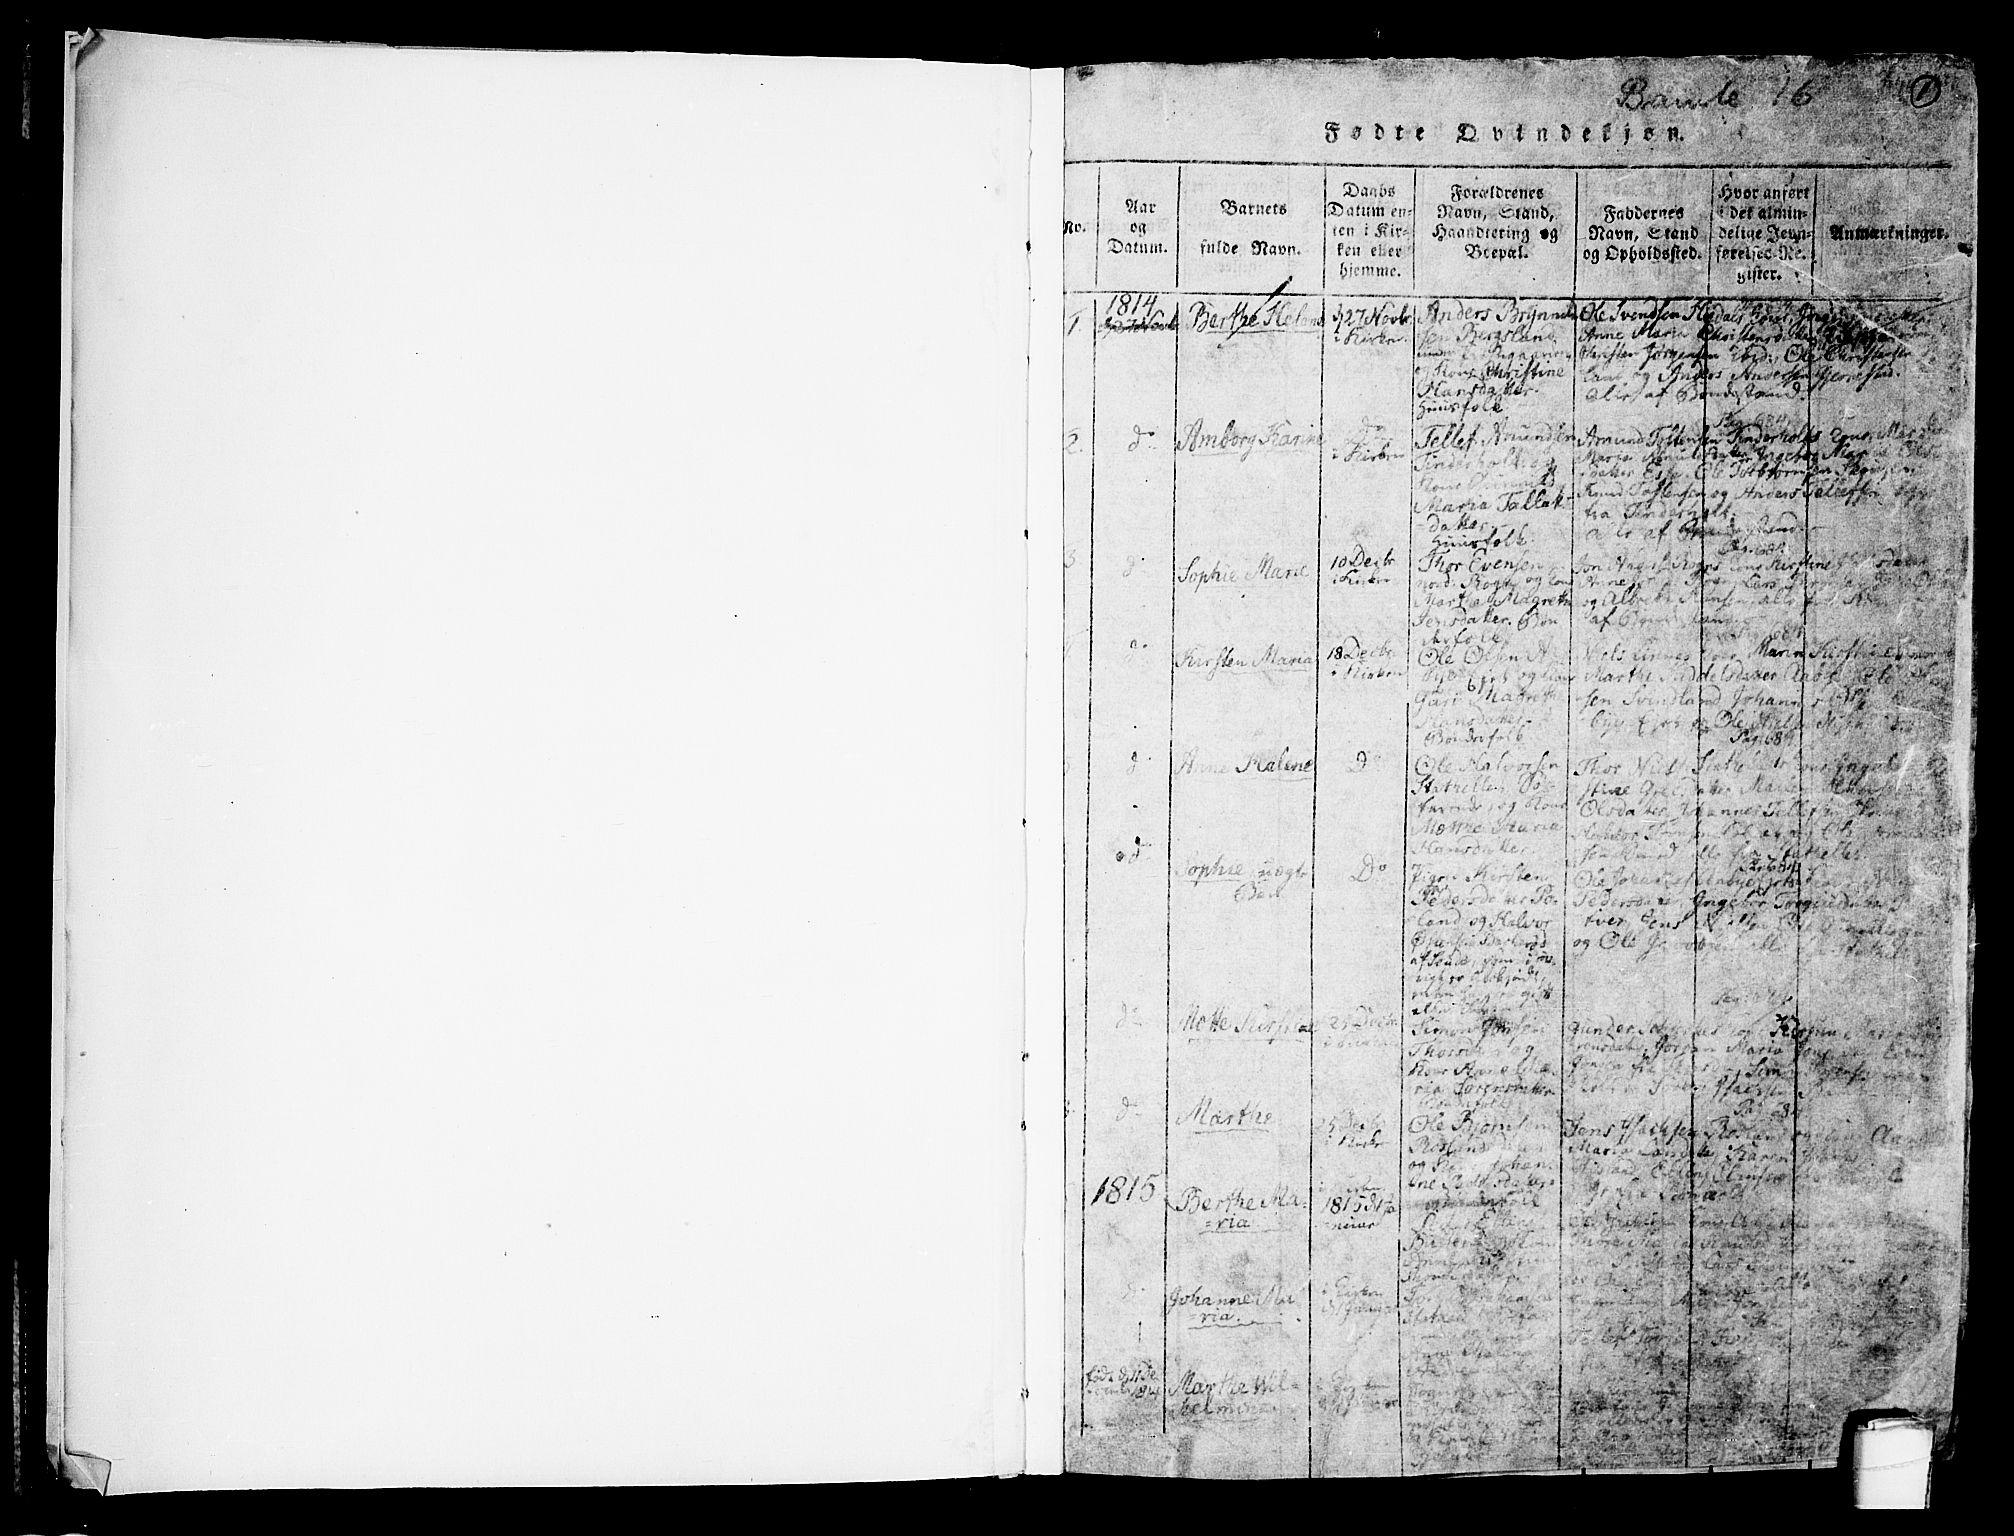 SAKO, Bamble kirkebøker, F/Fa/L0003: Ministerialbok nr. I 3 /1, 1814-1834, s. 1